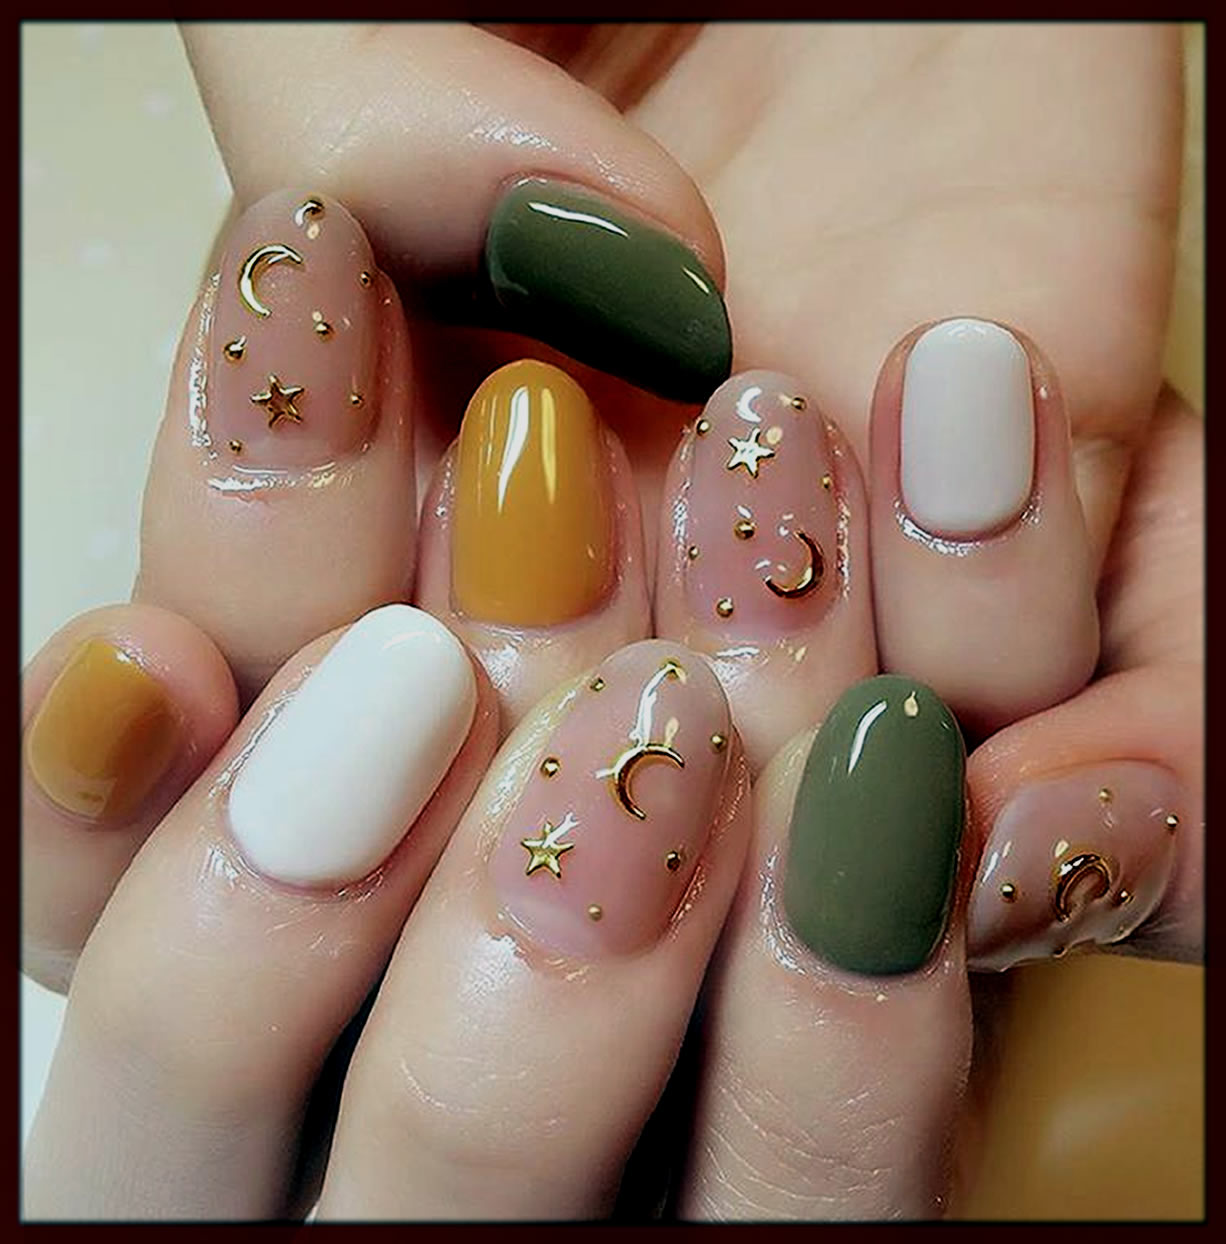 chand tara nail polish design for eid